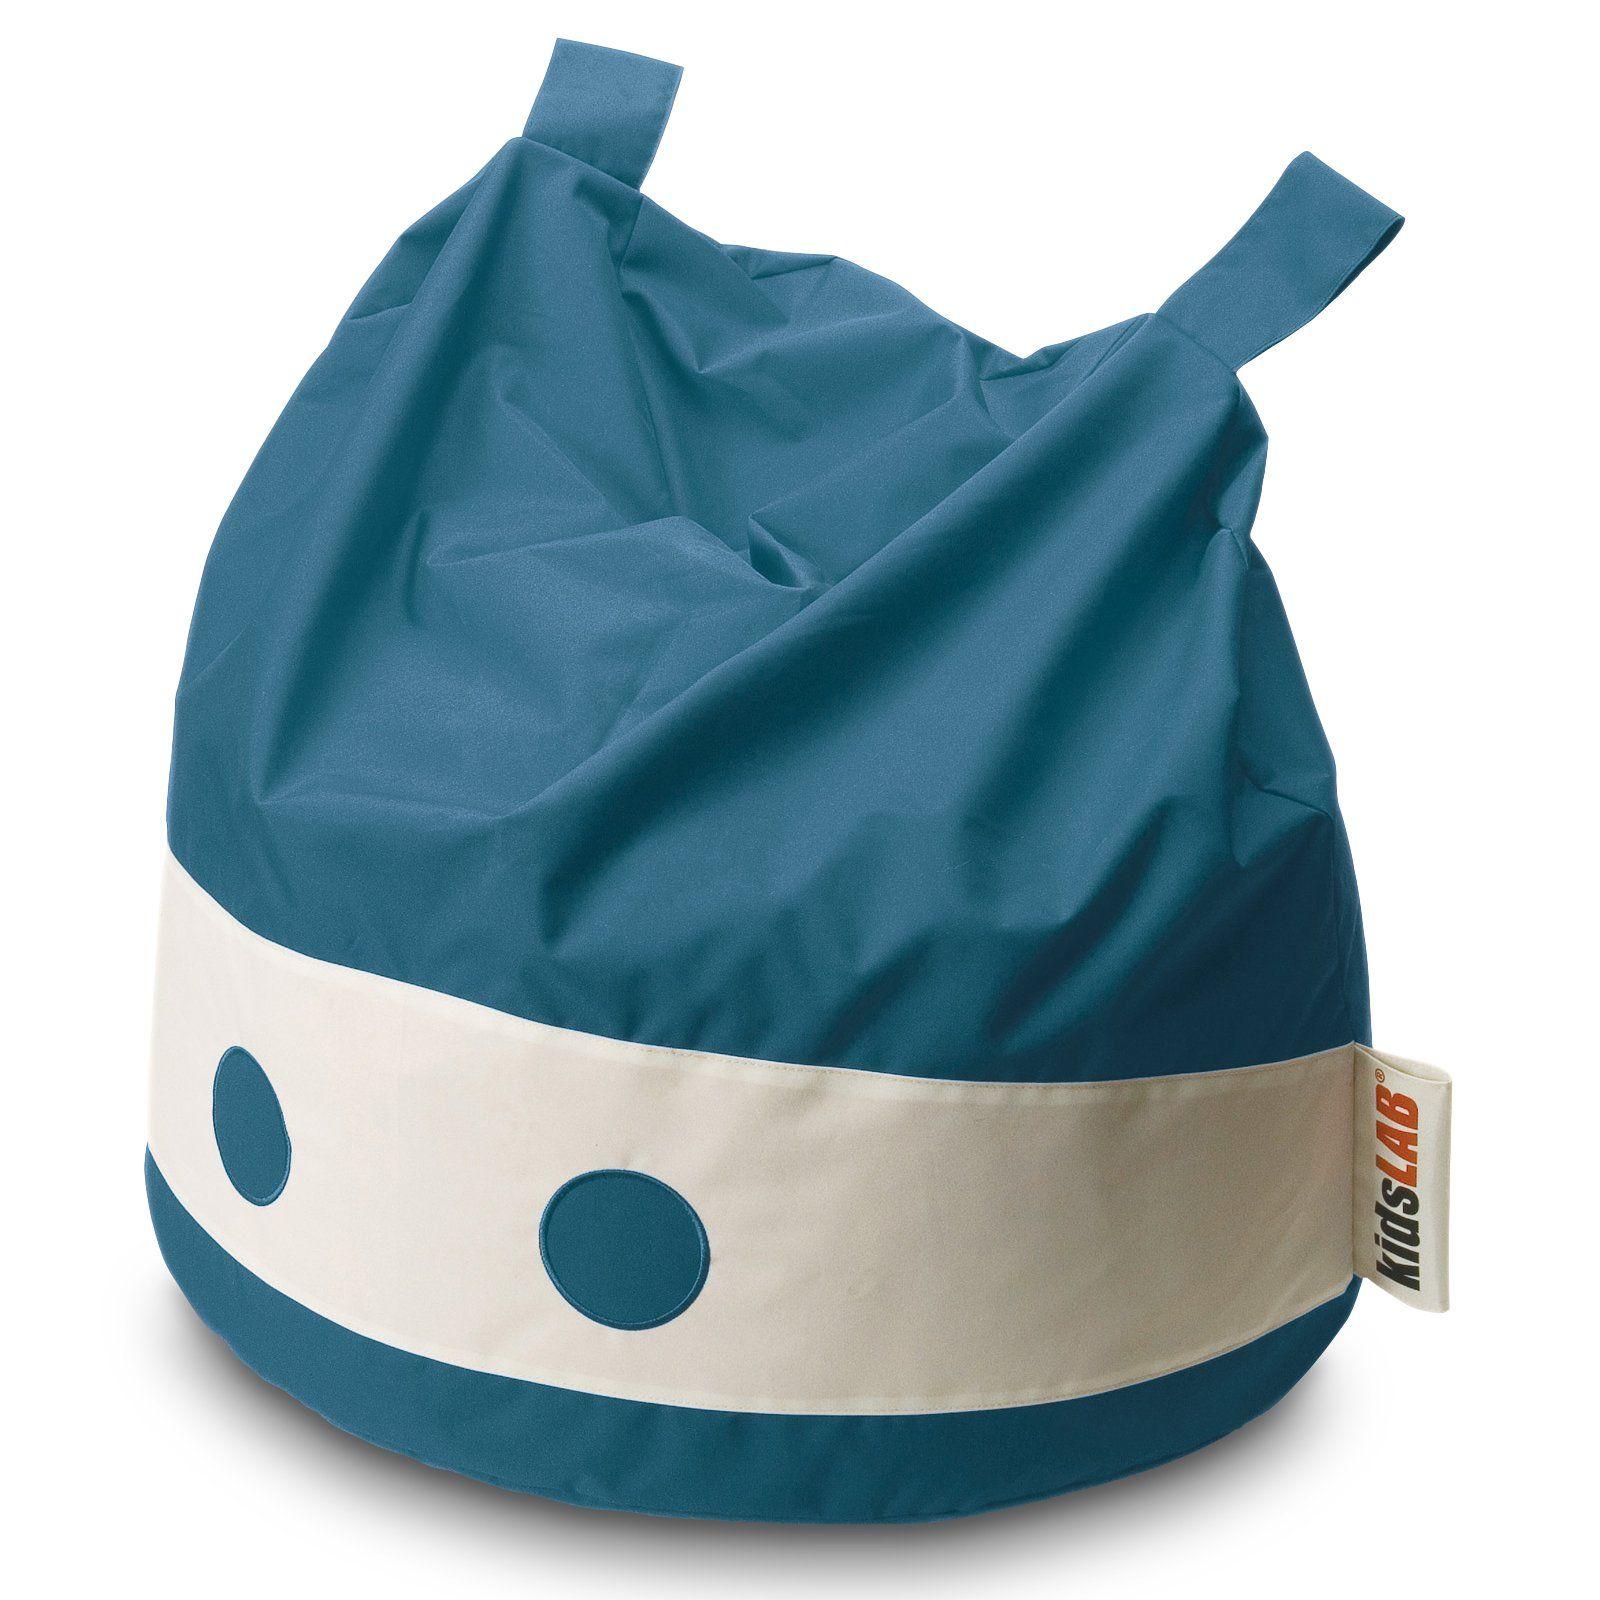 Modern Kids Ninja Beanbag Chair Blue Bean bag chair